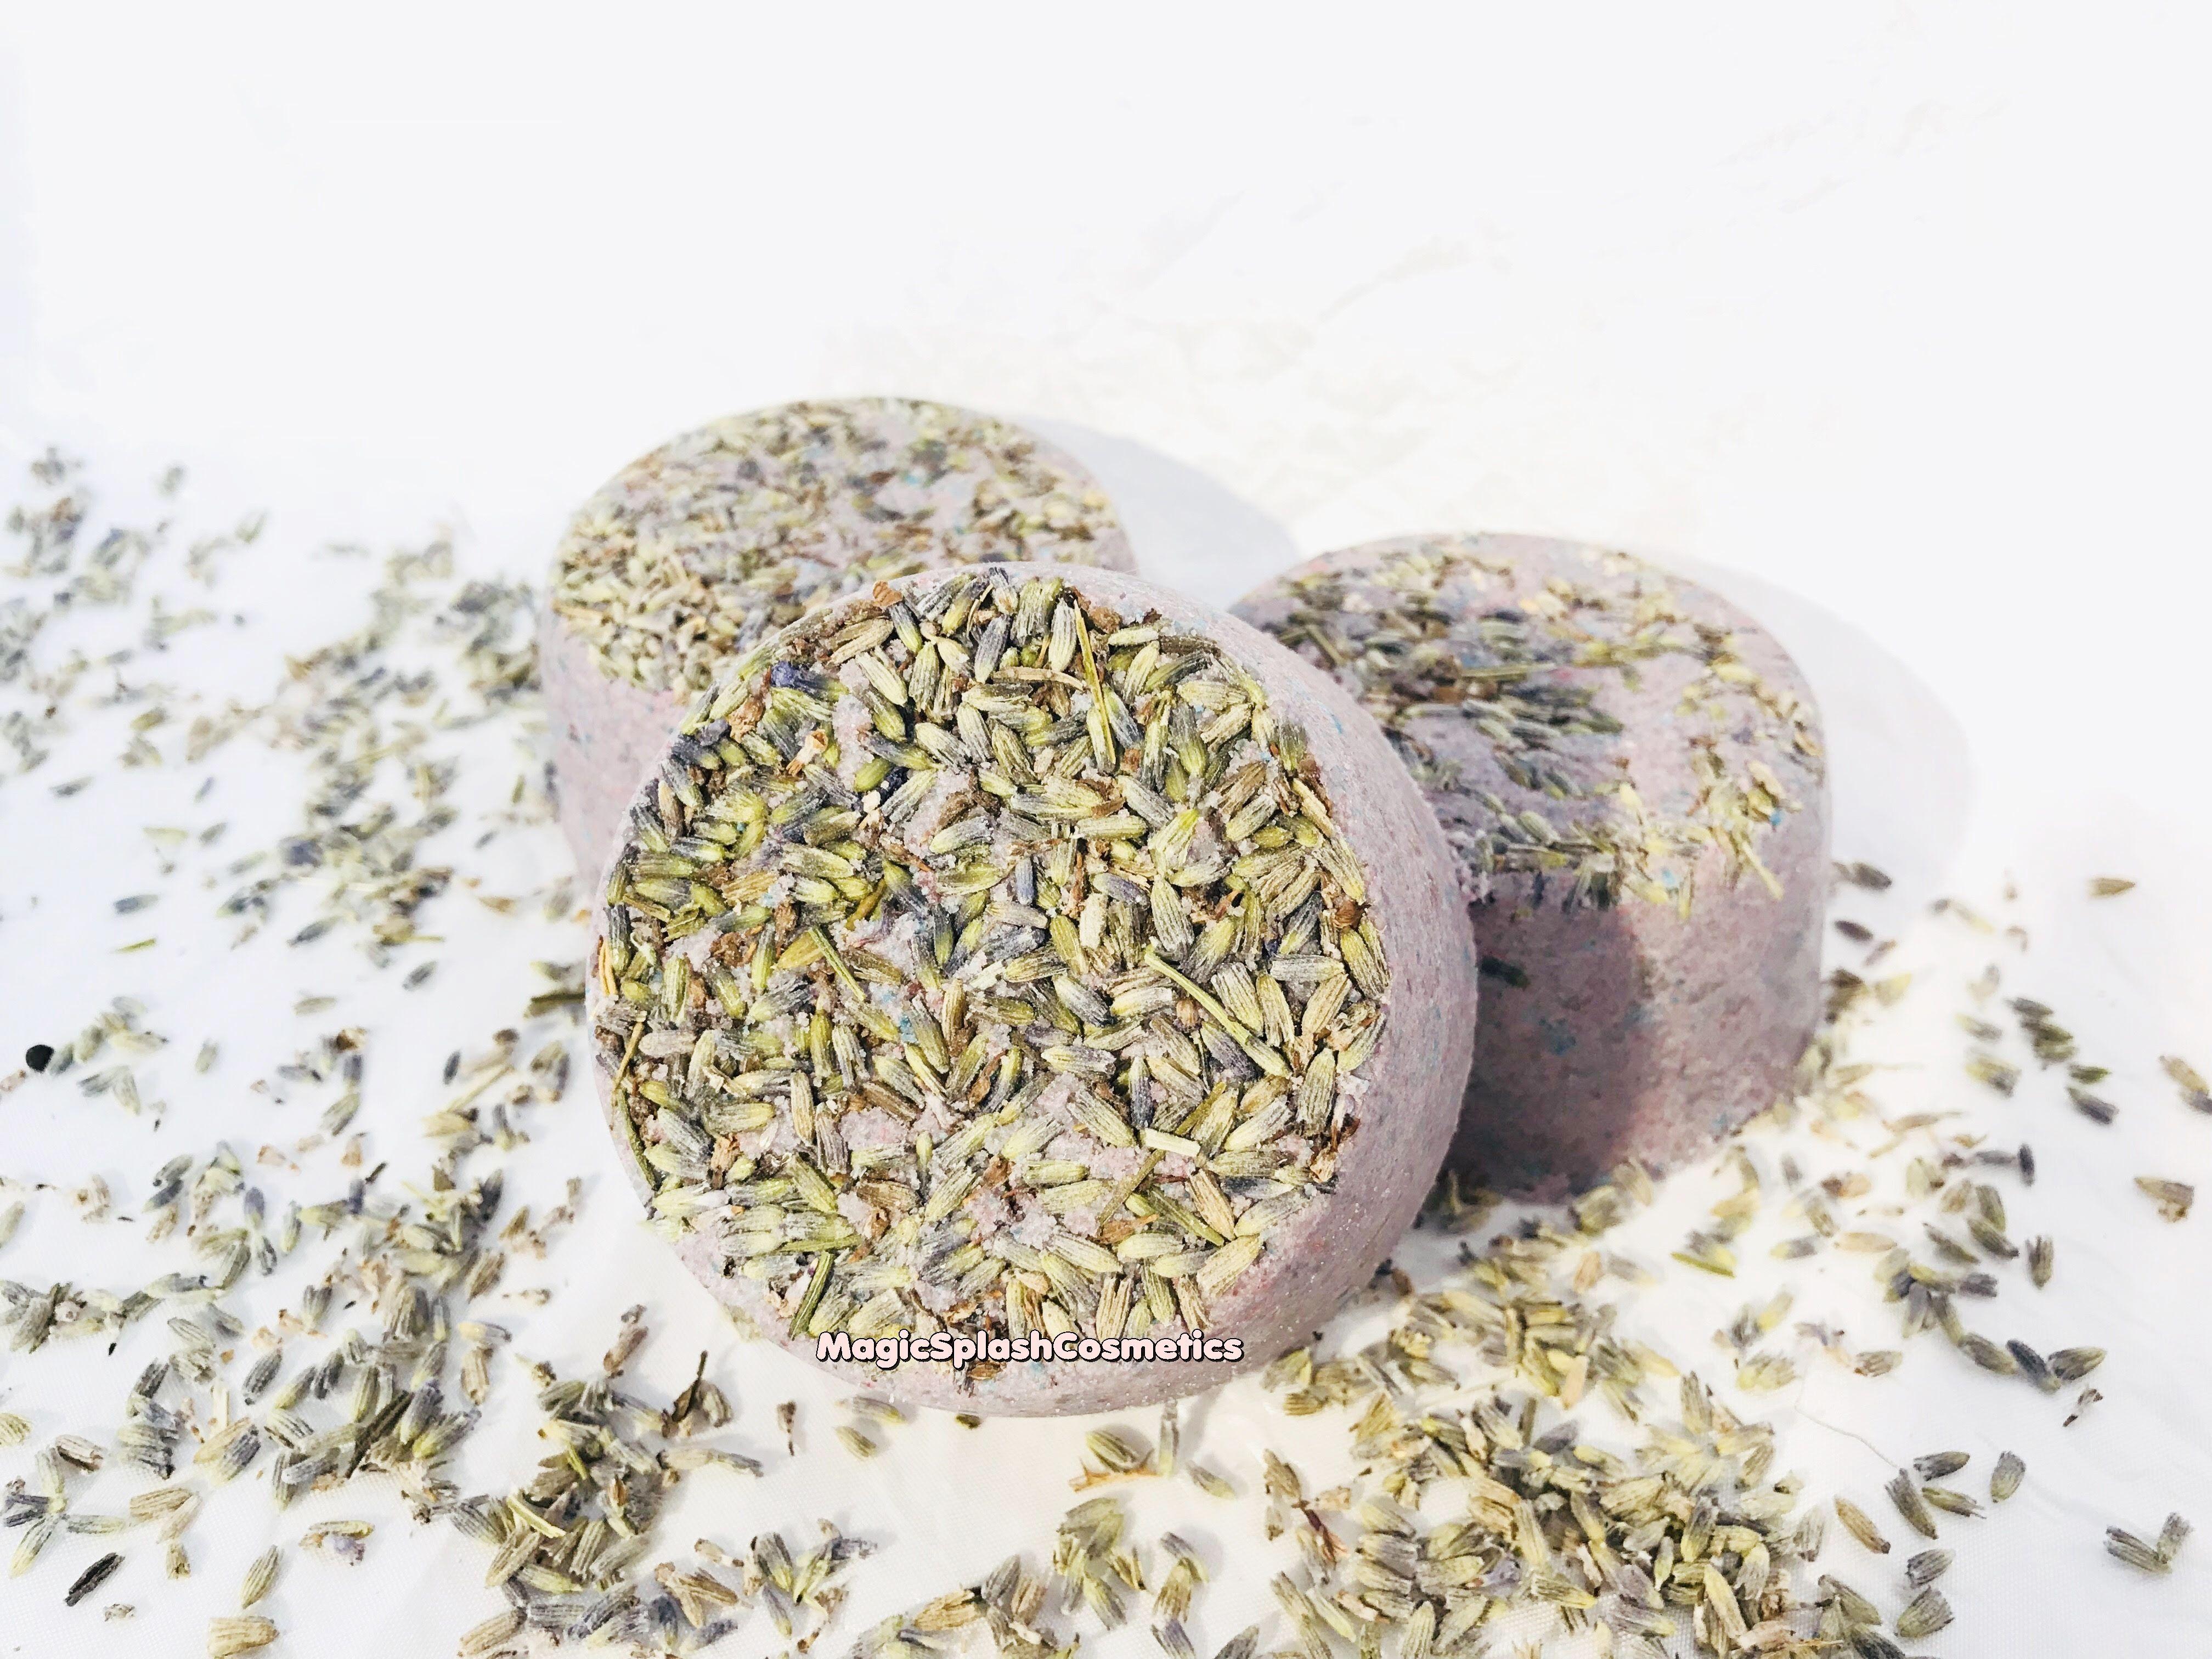 bathbomb organic vegan gift spagift lavenderbath crueltyfree bath lavender forher coconutoil essentialoil relaxation spa